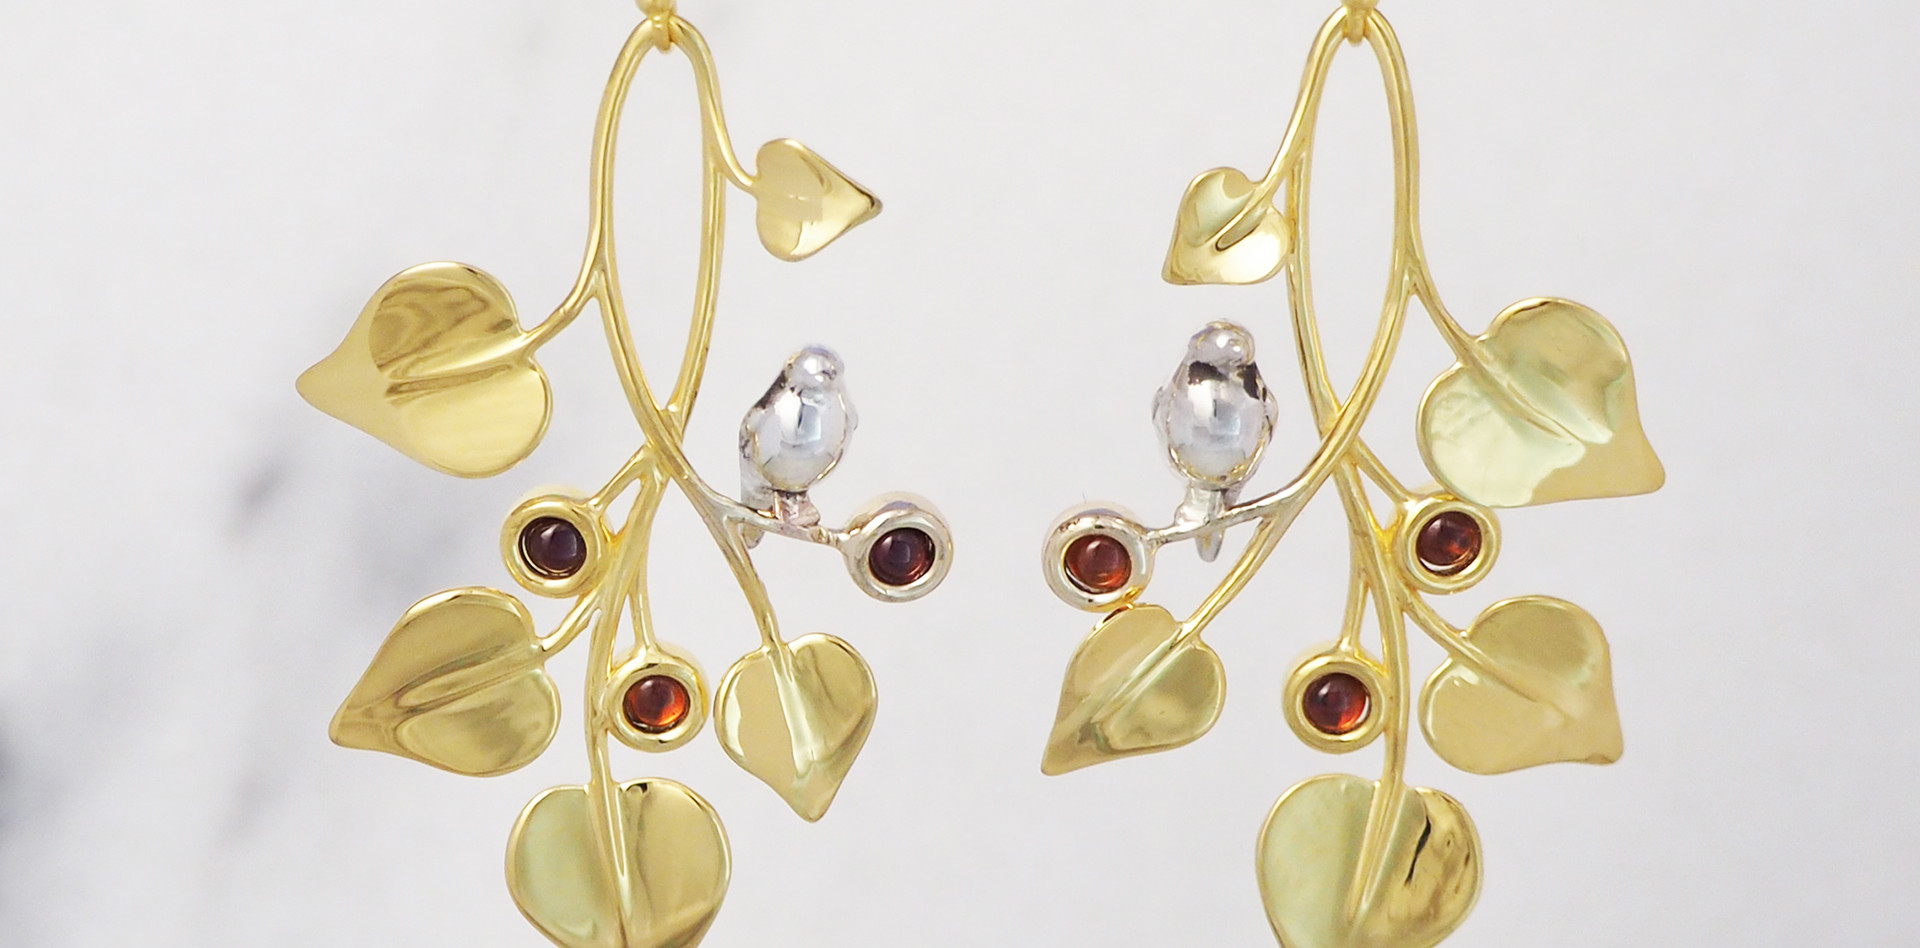 Doves in Draping Vines, Earrings-front